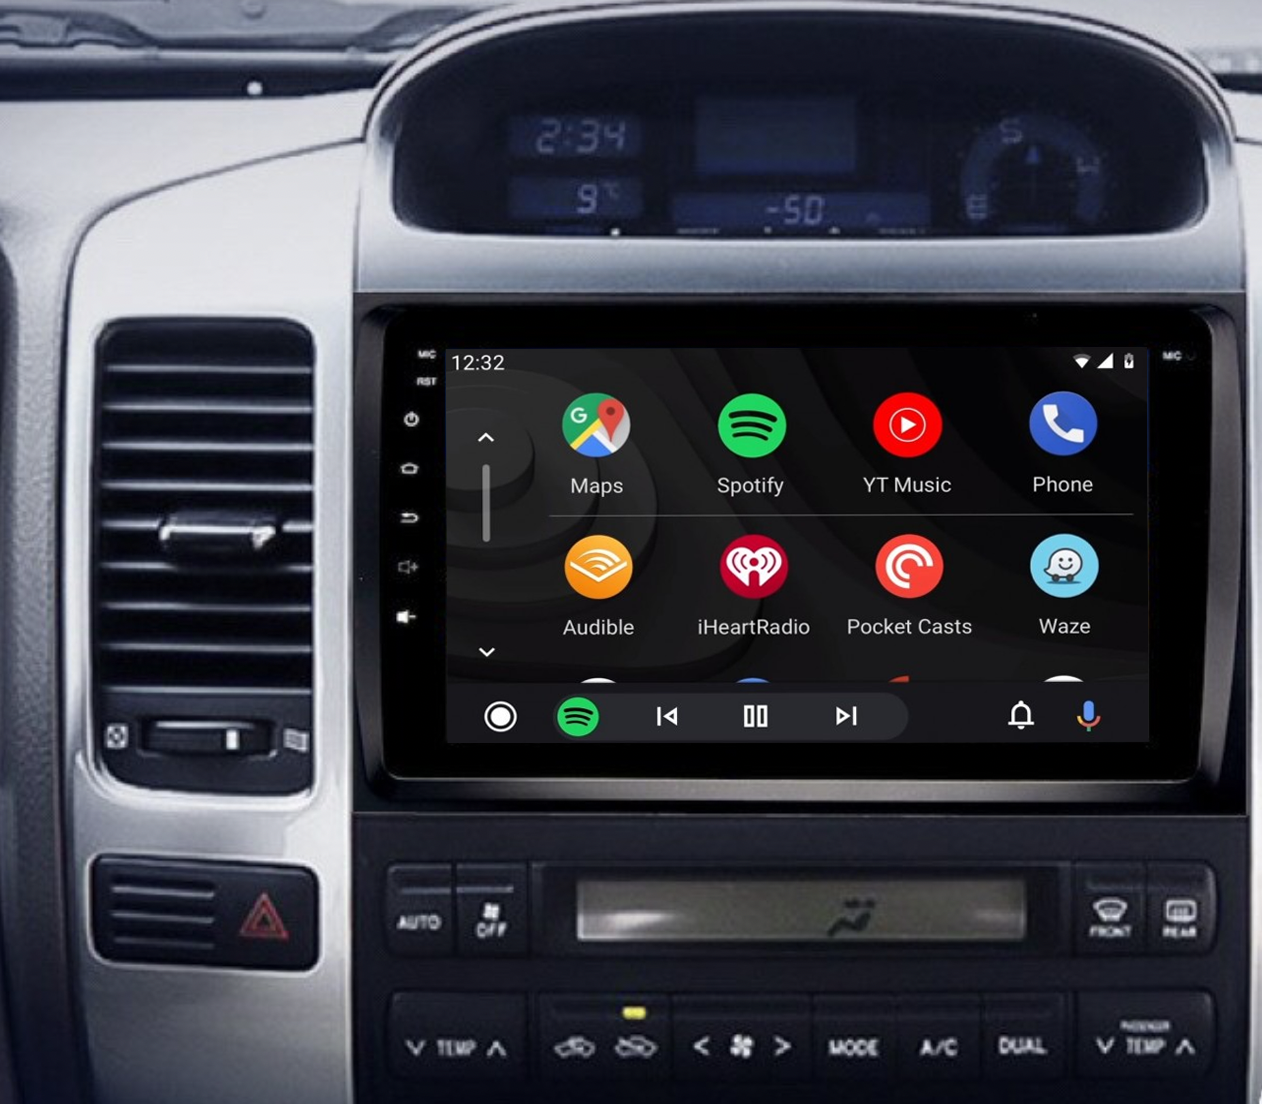 Ecran tactile QLED Android 11.0 + Apple Carplay sans fil Toyota Land Cruiser J120 de 2002 à 2009